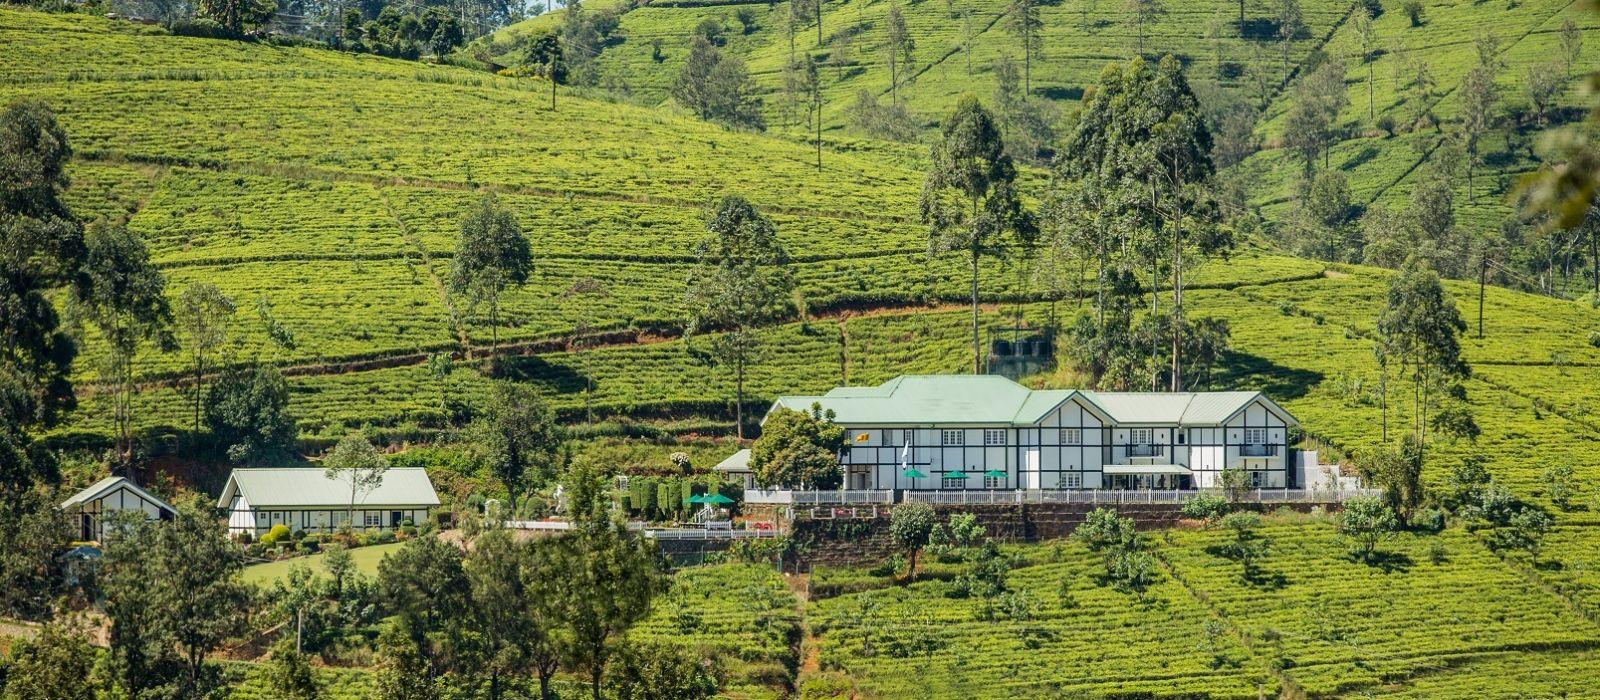 Enchanting Sands and Tea Trails of Sri Lanka Tour Trip 5